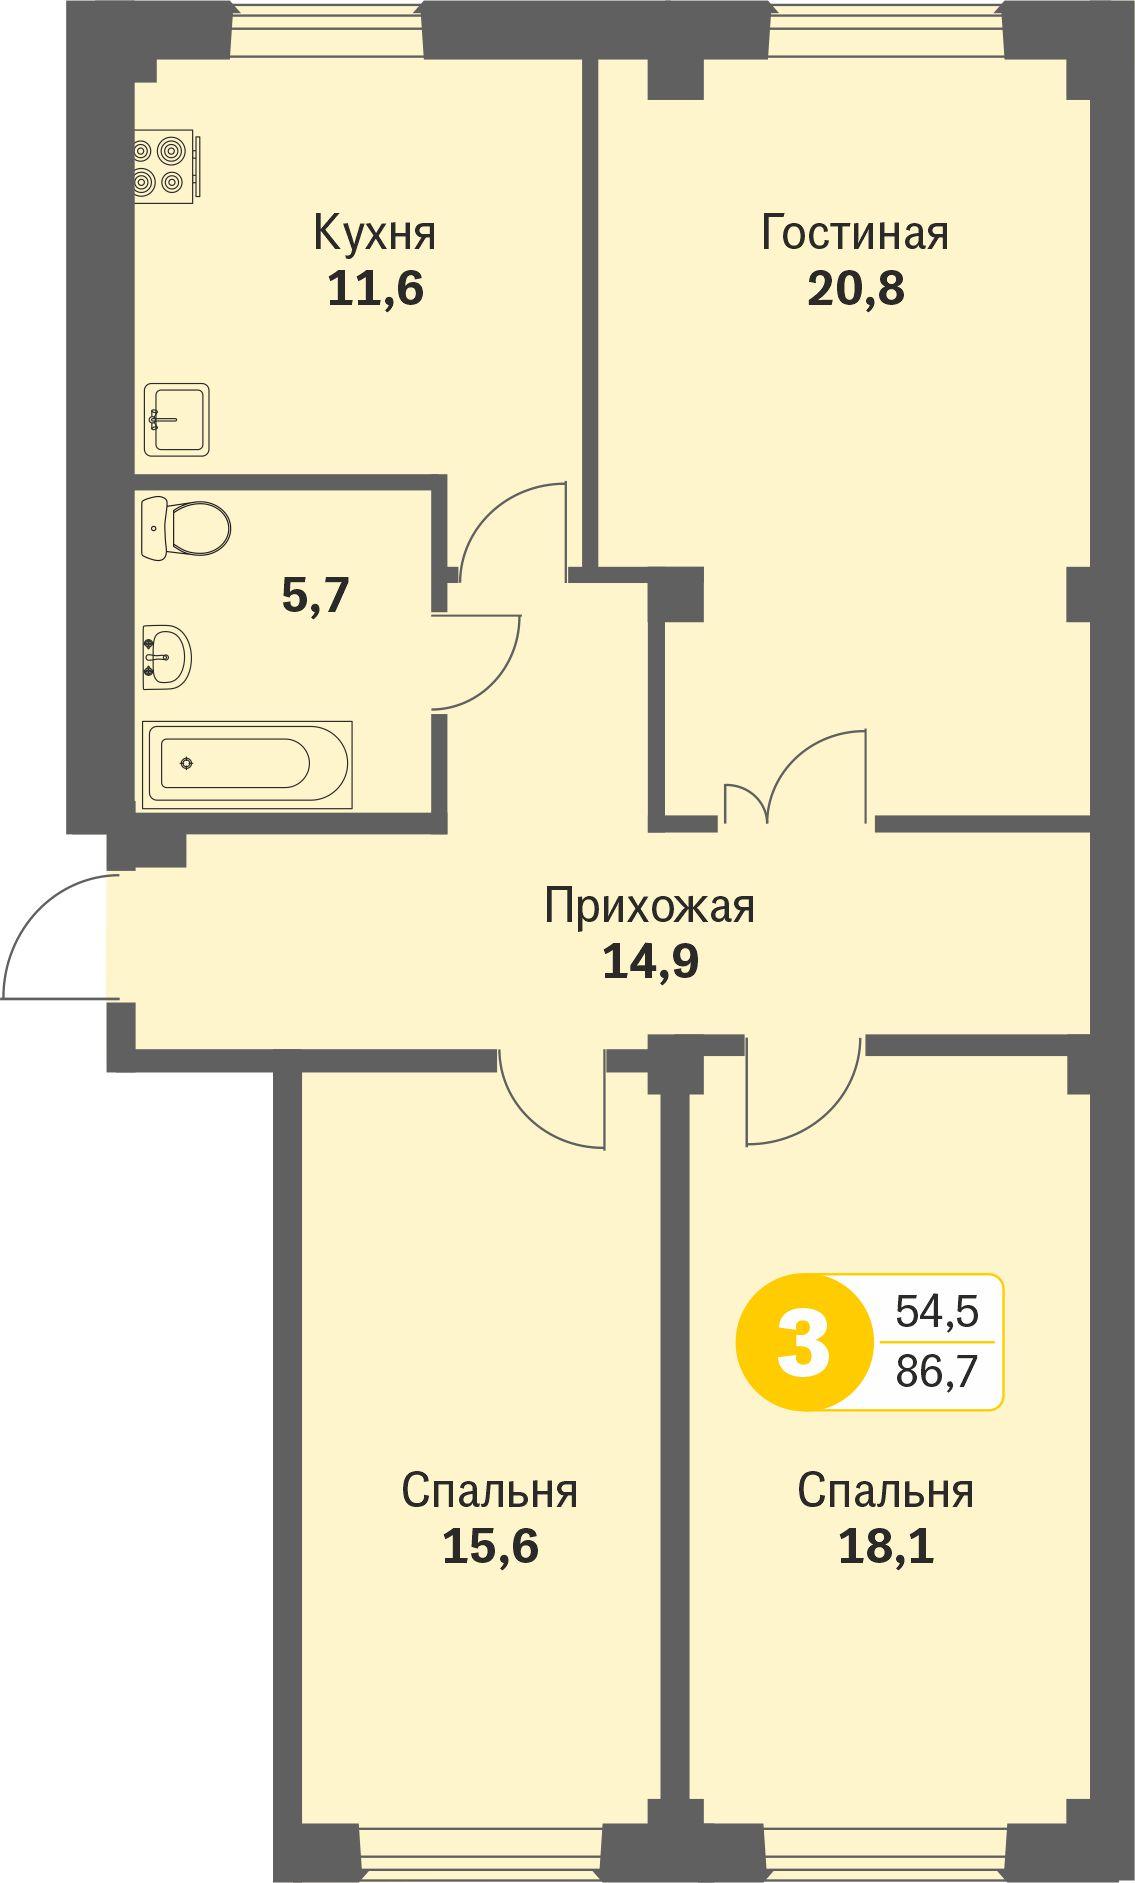 ул. Свиридова, 14, квартира 507 - Однокомнатная